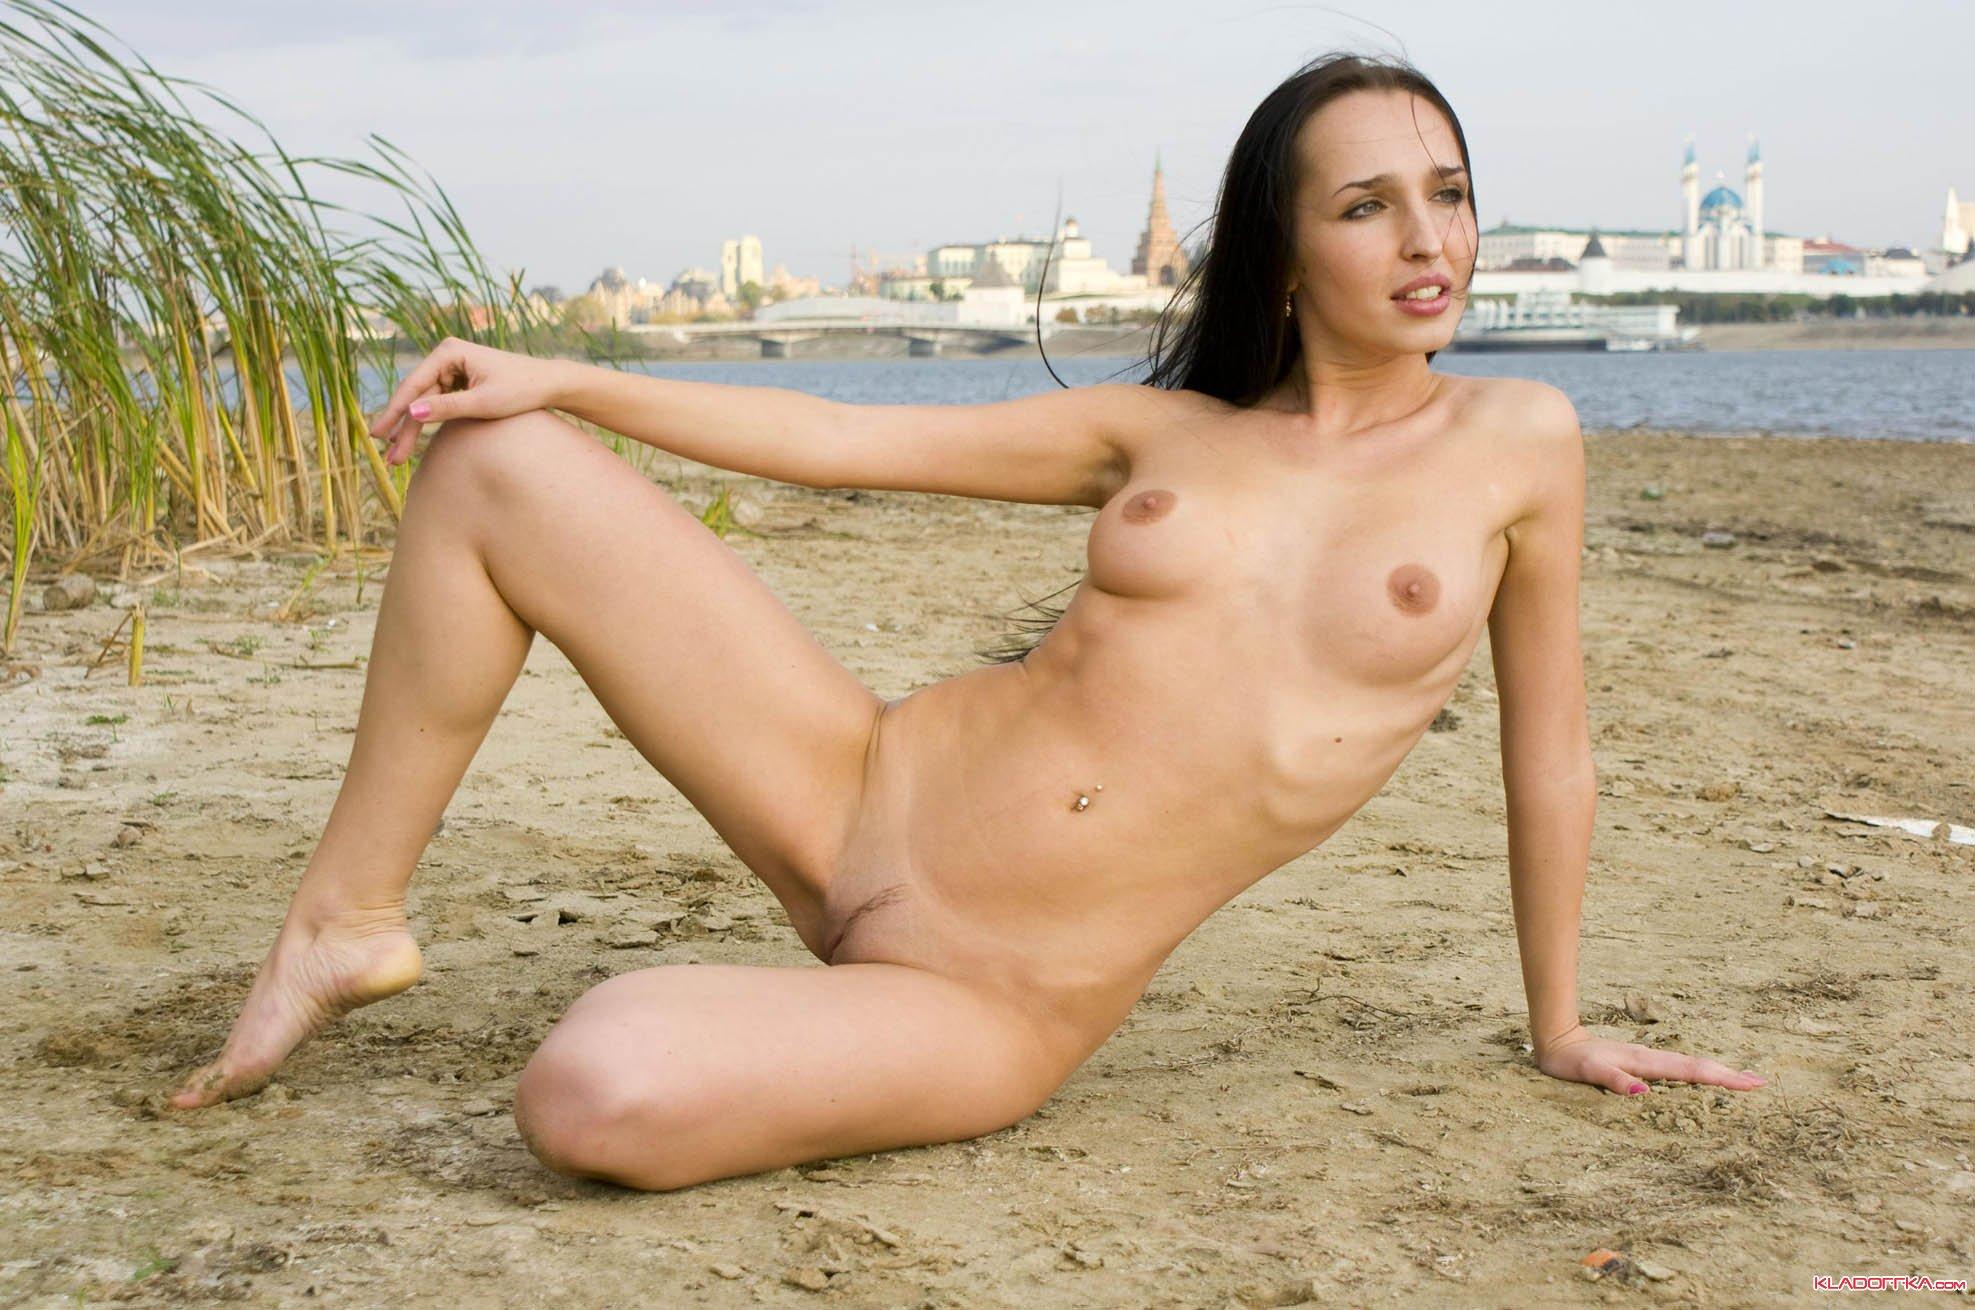 Картинки голые девушки в калгари